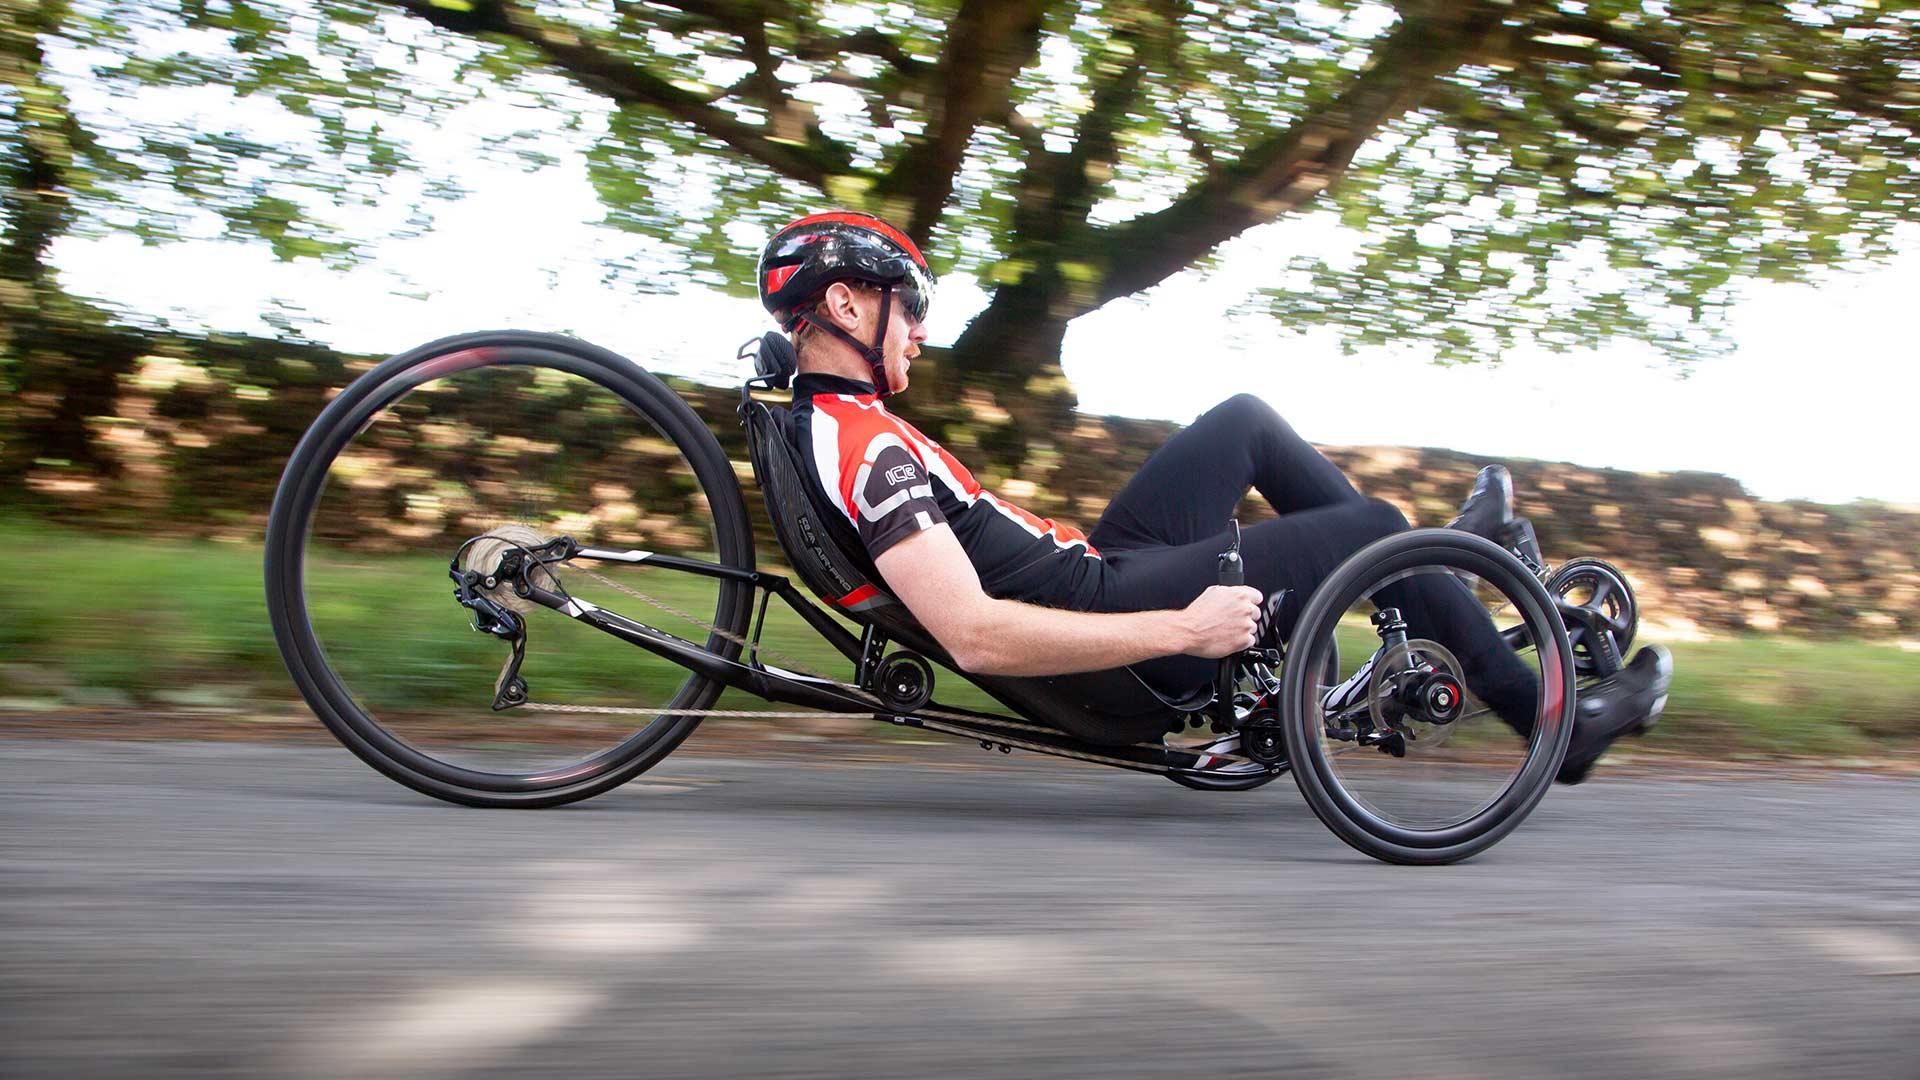 Ice Vtx Sporty Fast Recumbent Racing Trike Bike